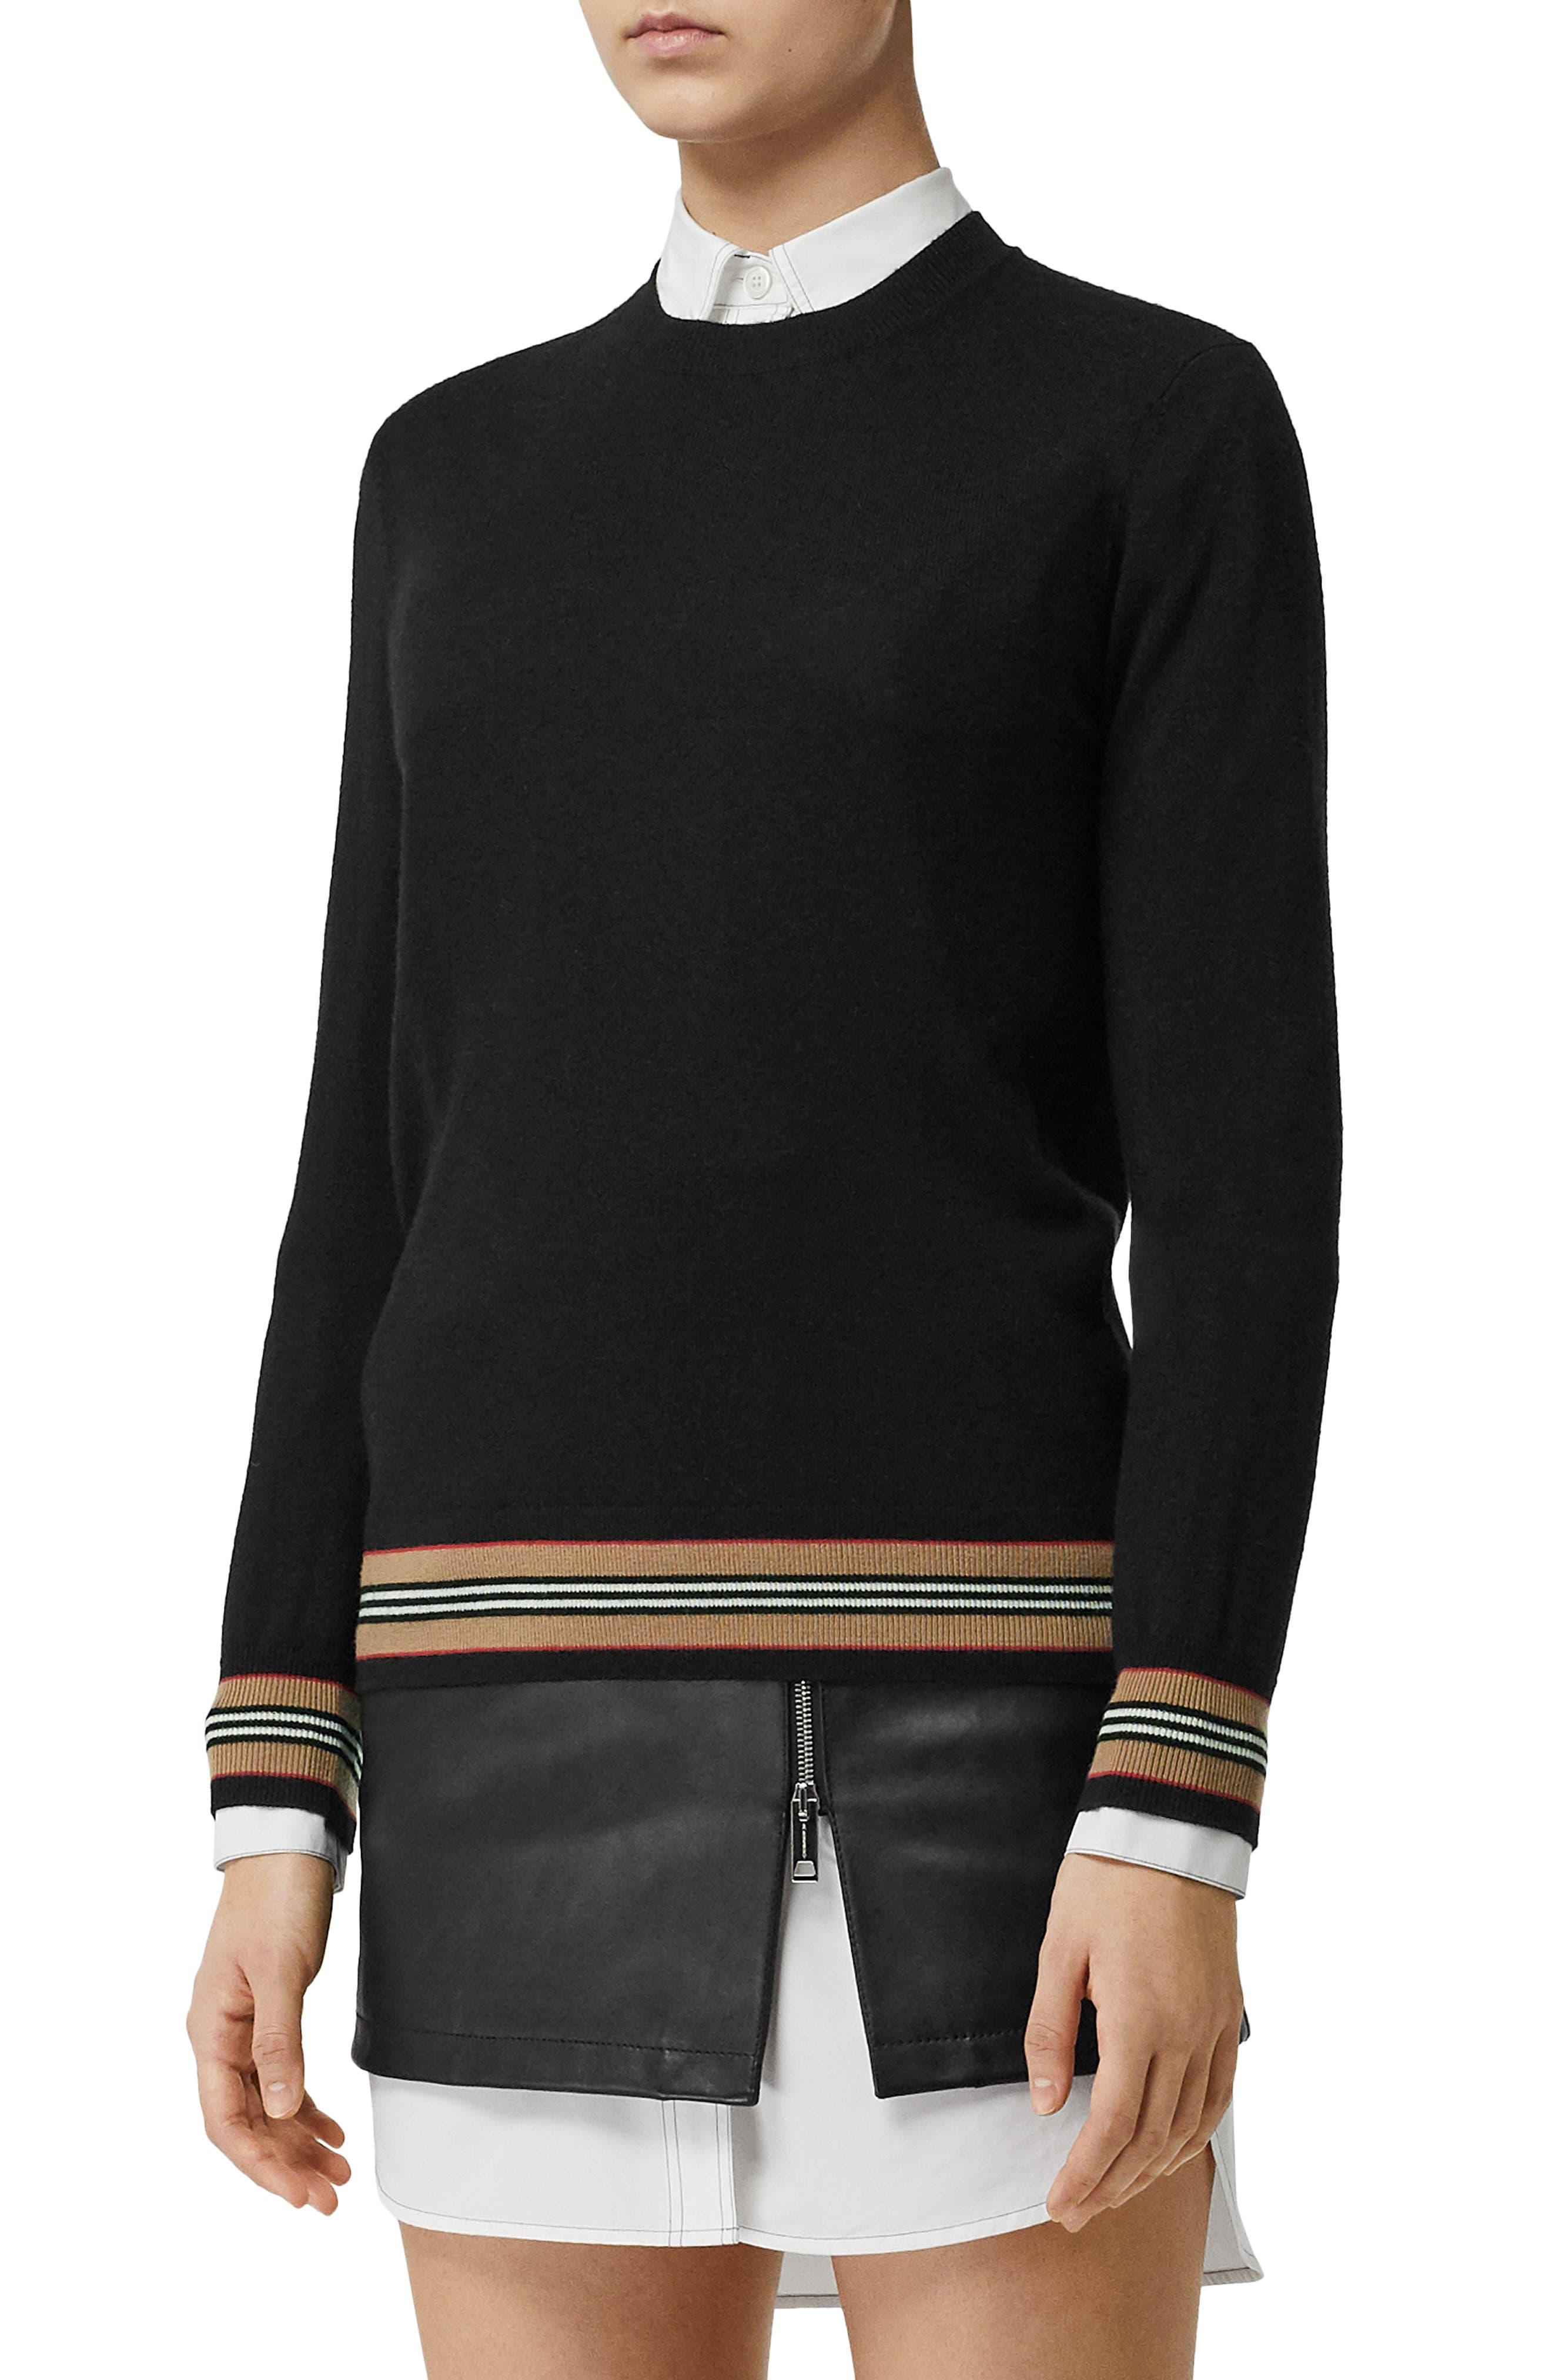 BURBERRY, Stripe Trim Merino Wool Sweater, Main thumbnail 1, color, BLACK